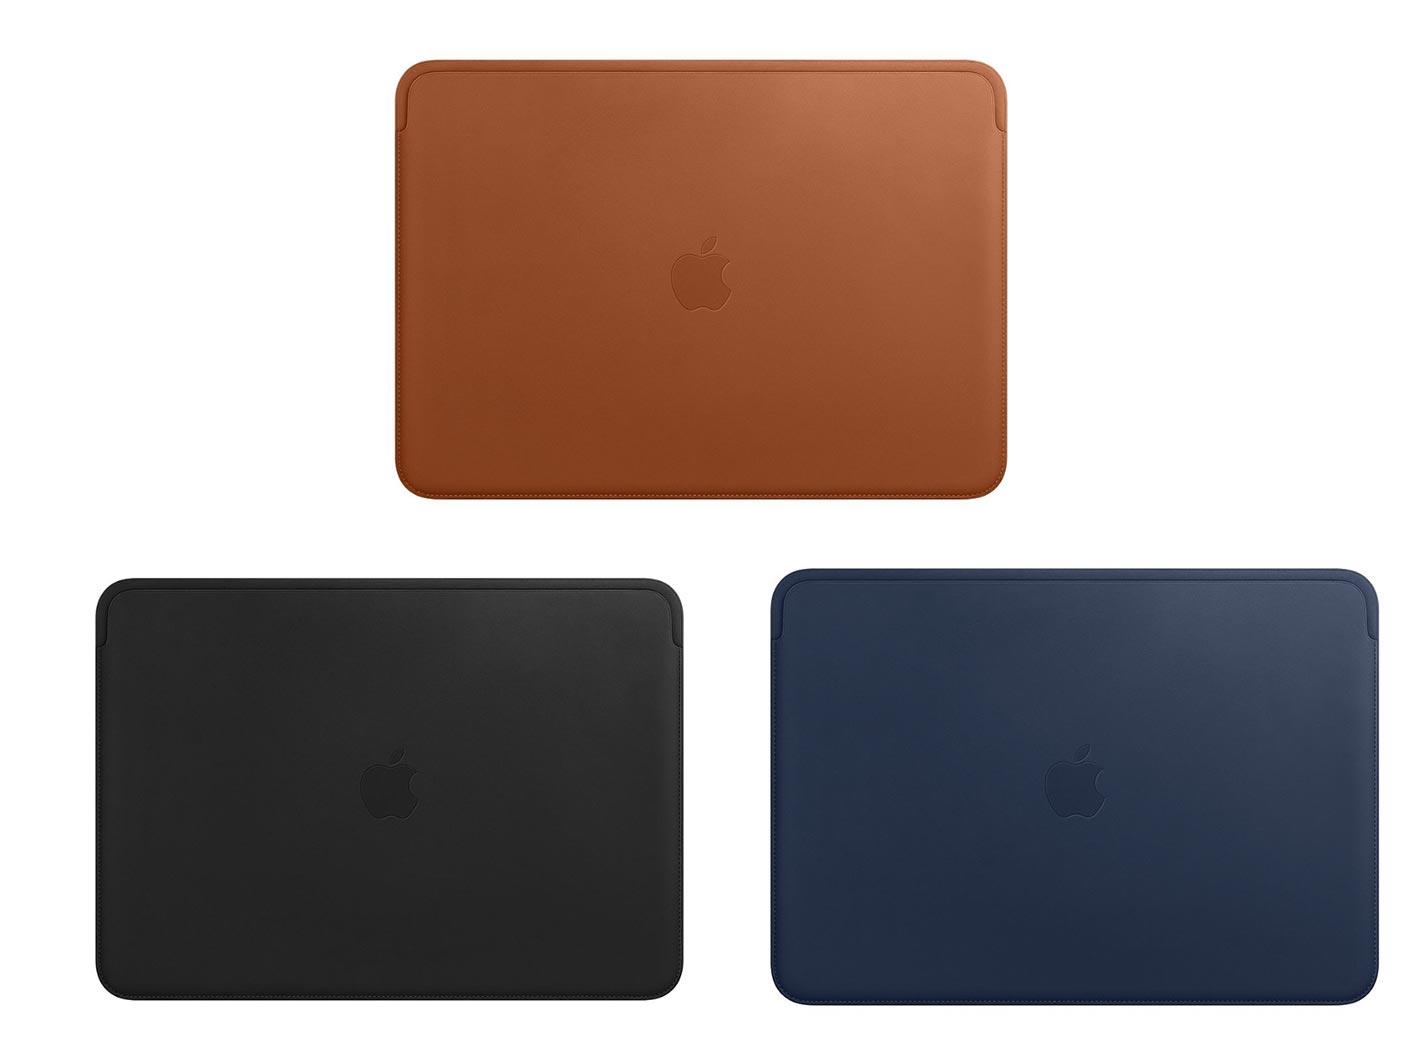 Macbookprosleve